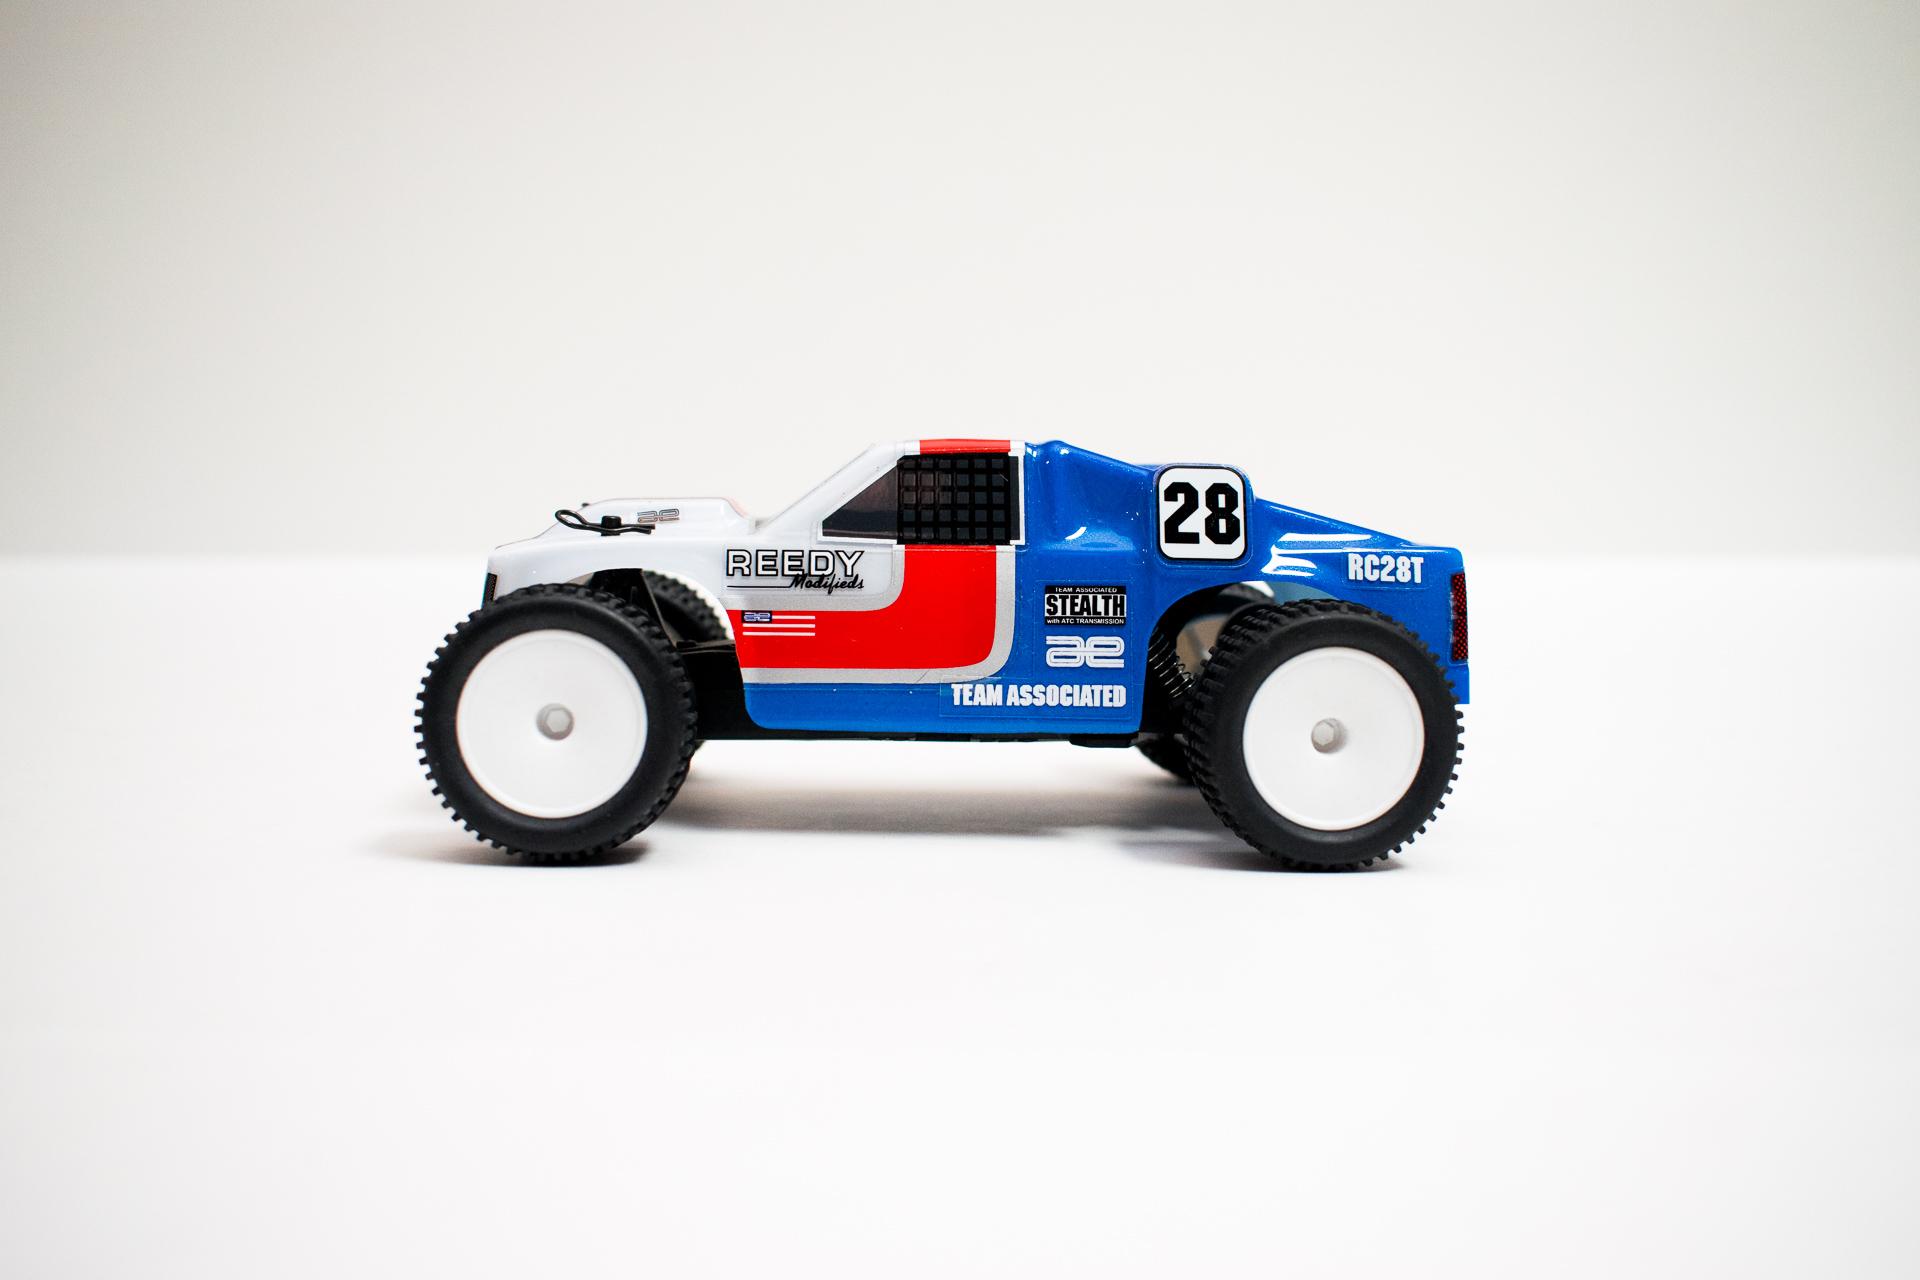 Team Associated RC28T - Side